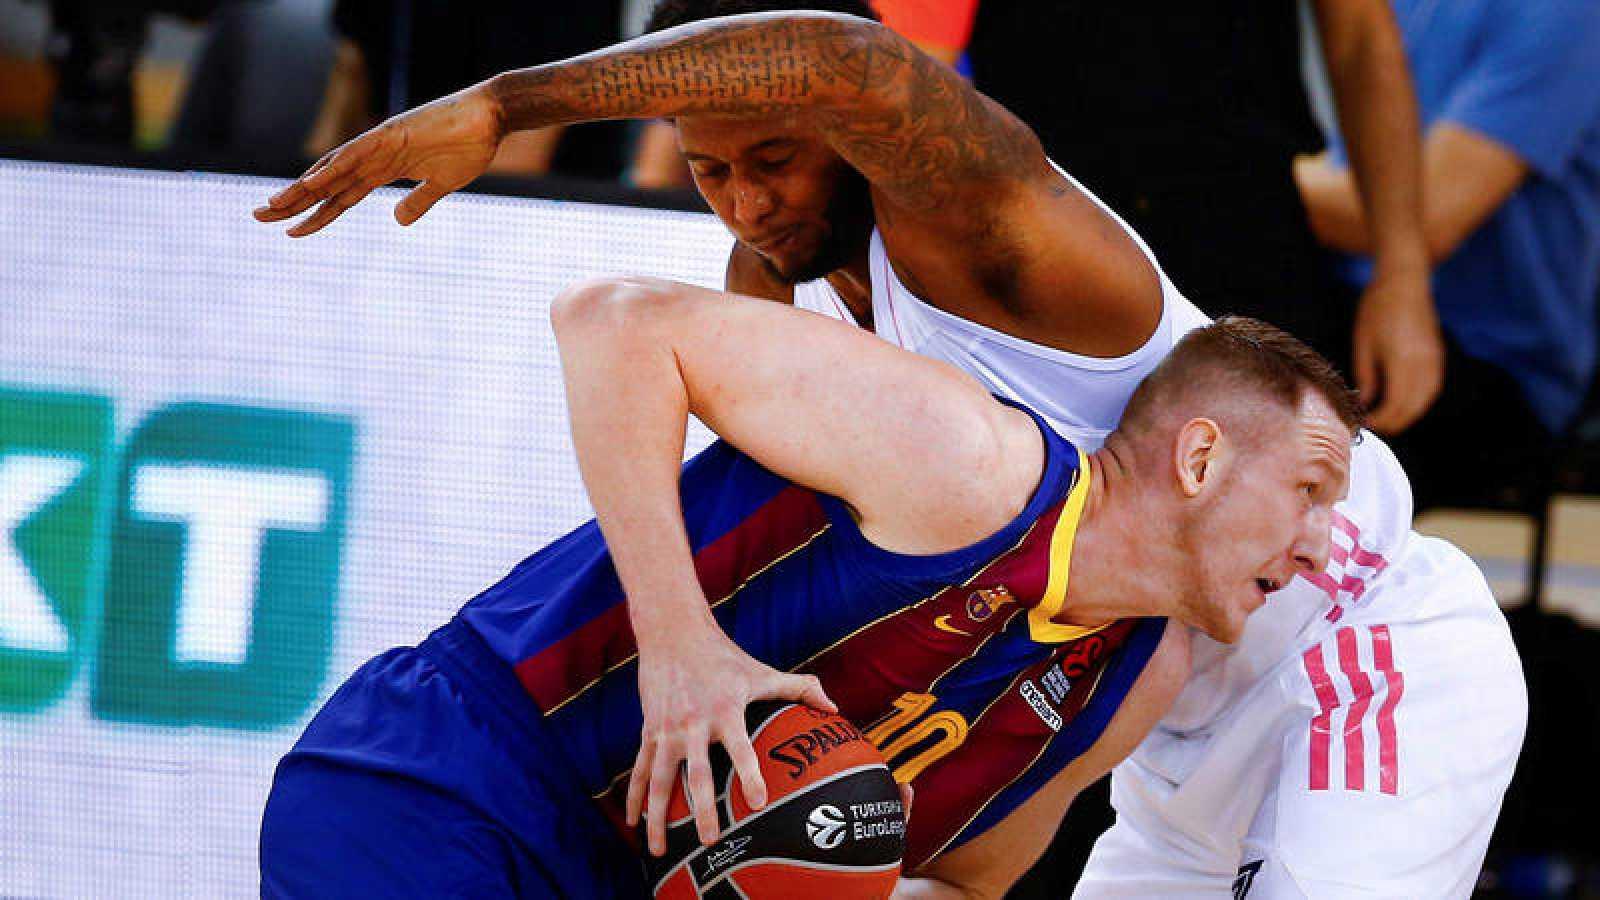 El alero letón del Barça Rolands Smits lucha con Trey Thompkins, del Real Madrid.